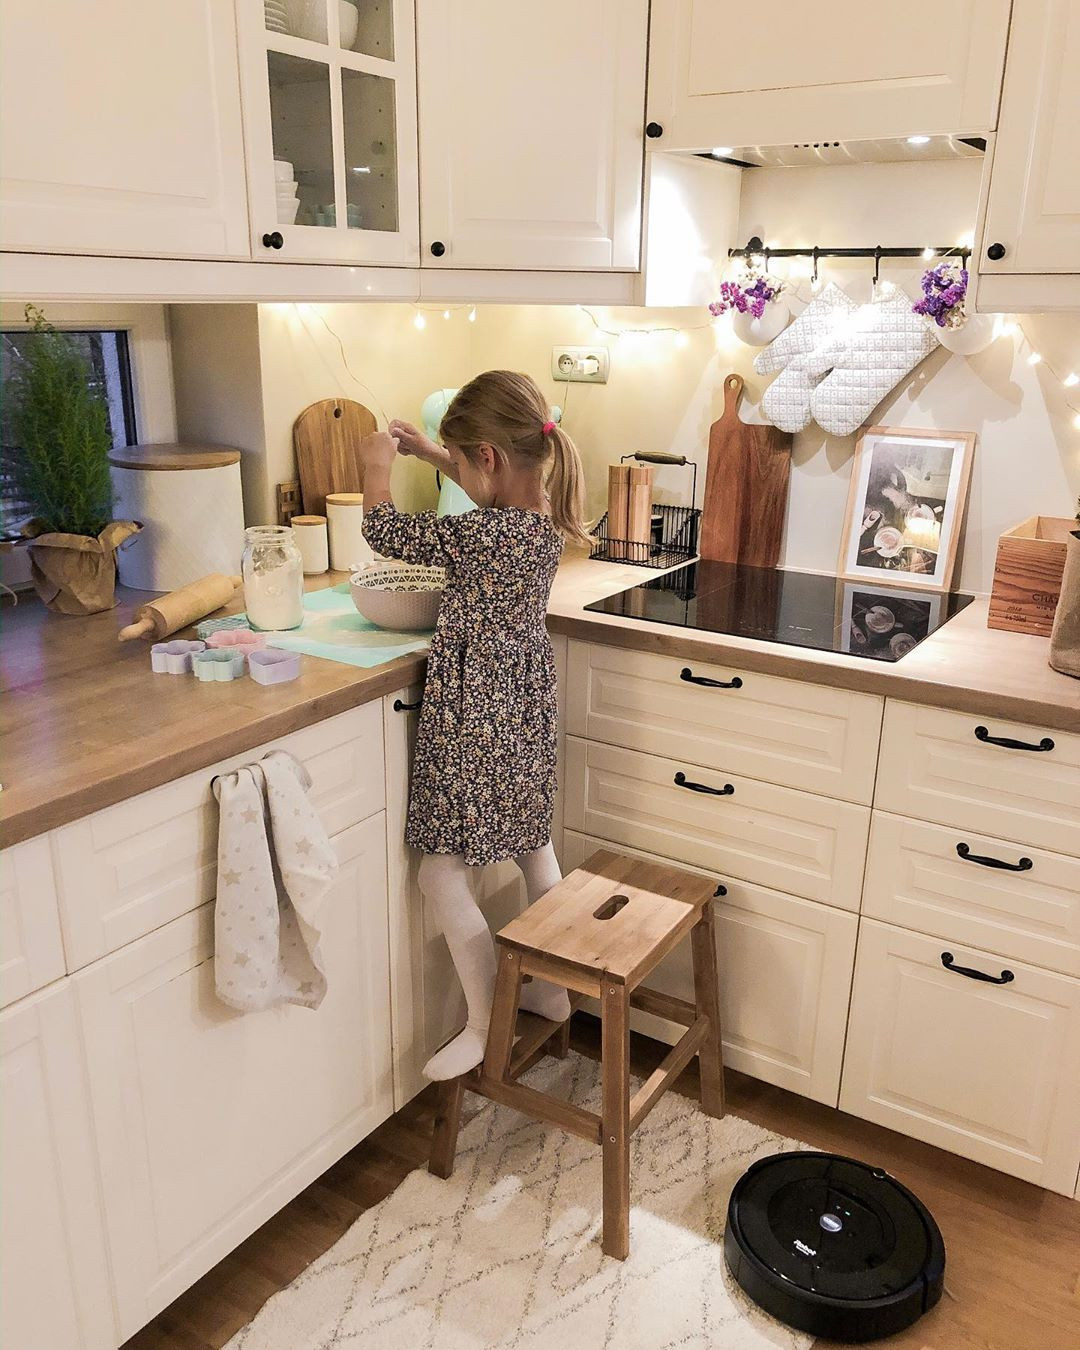 46 Elegant Small White Kitchen Design Ideas For Modern Home